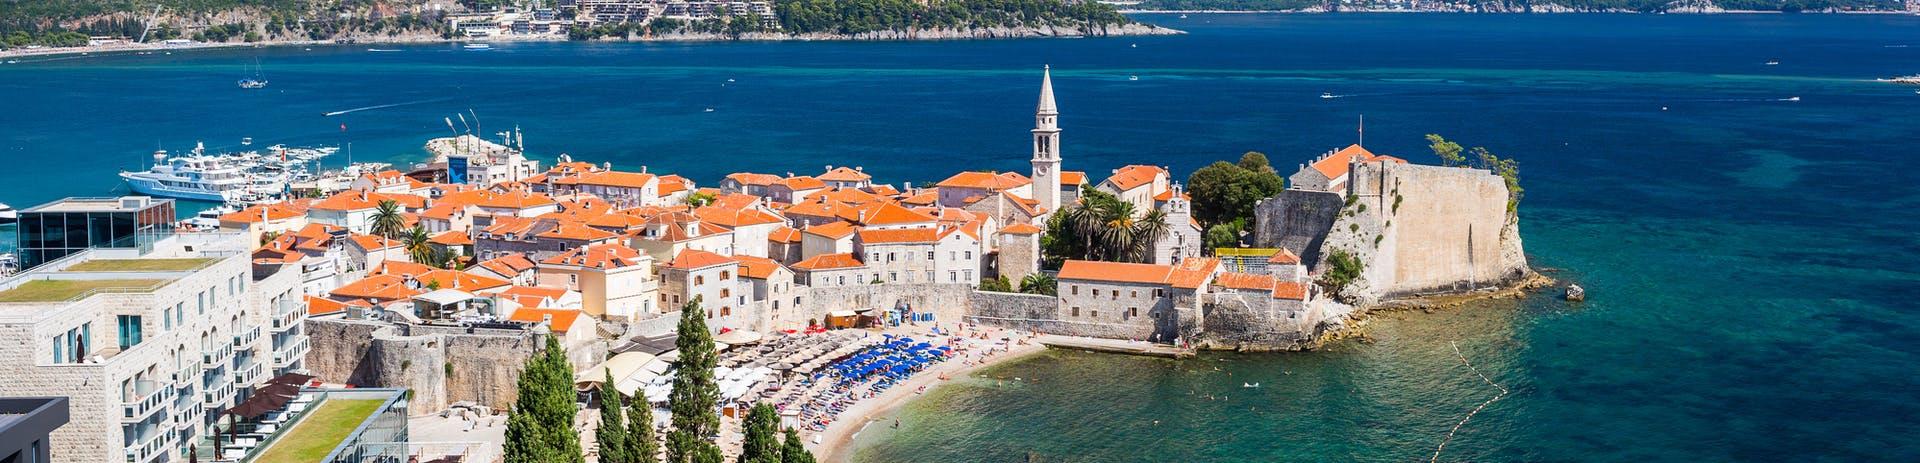 Picture of Montenegro